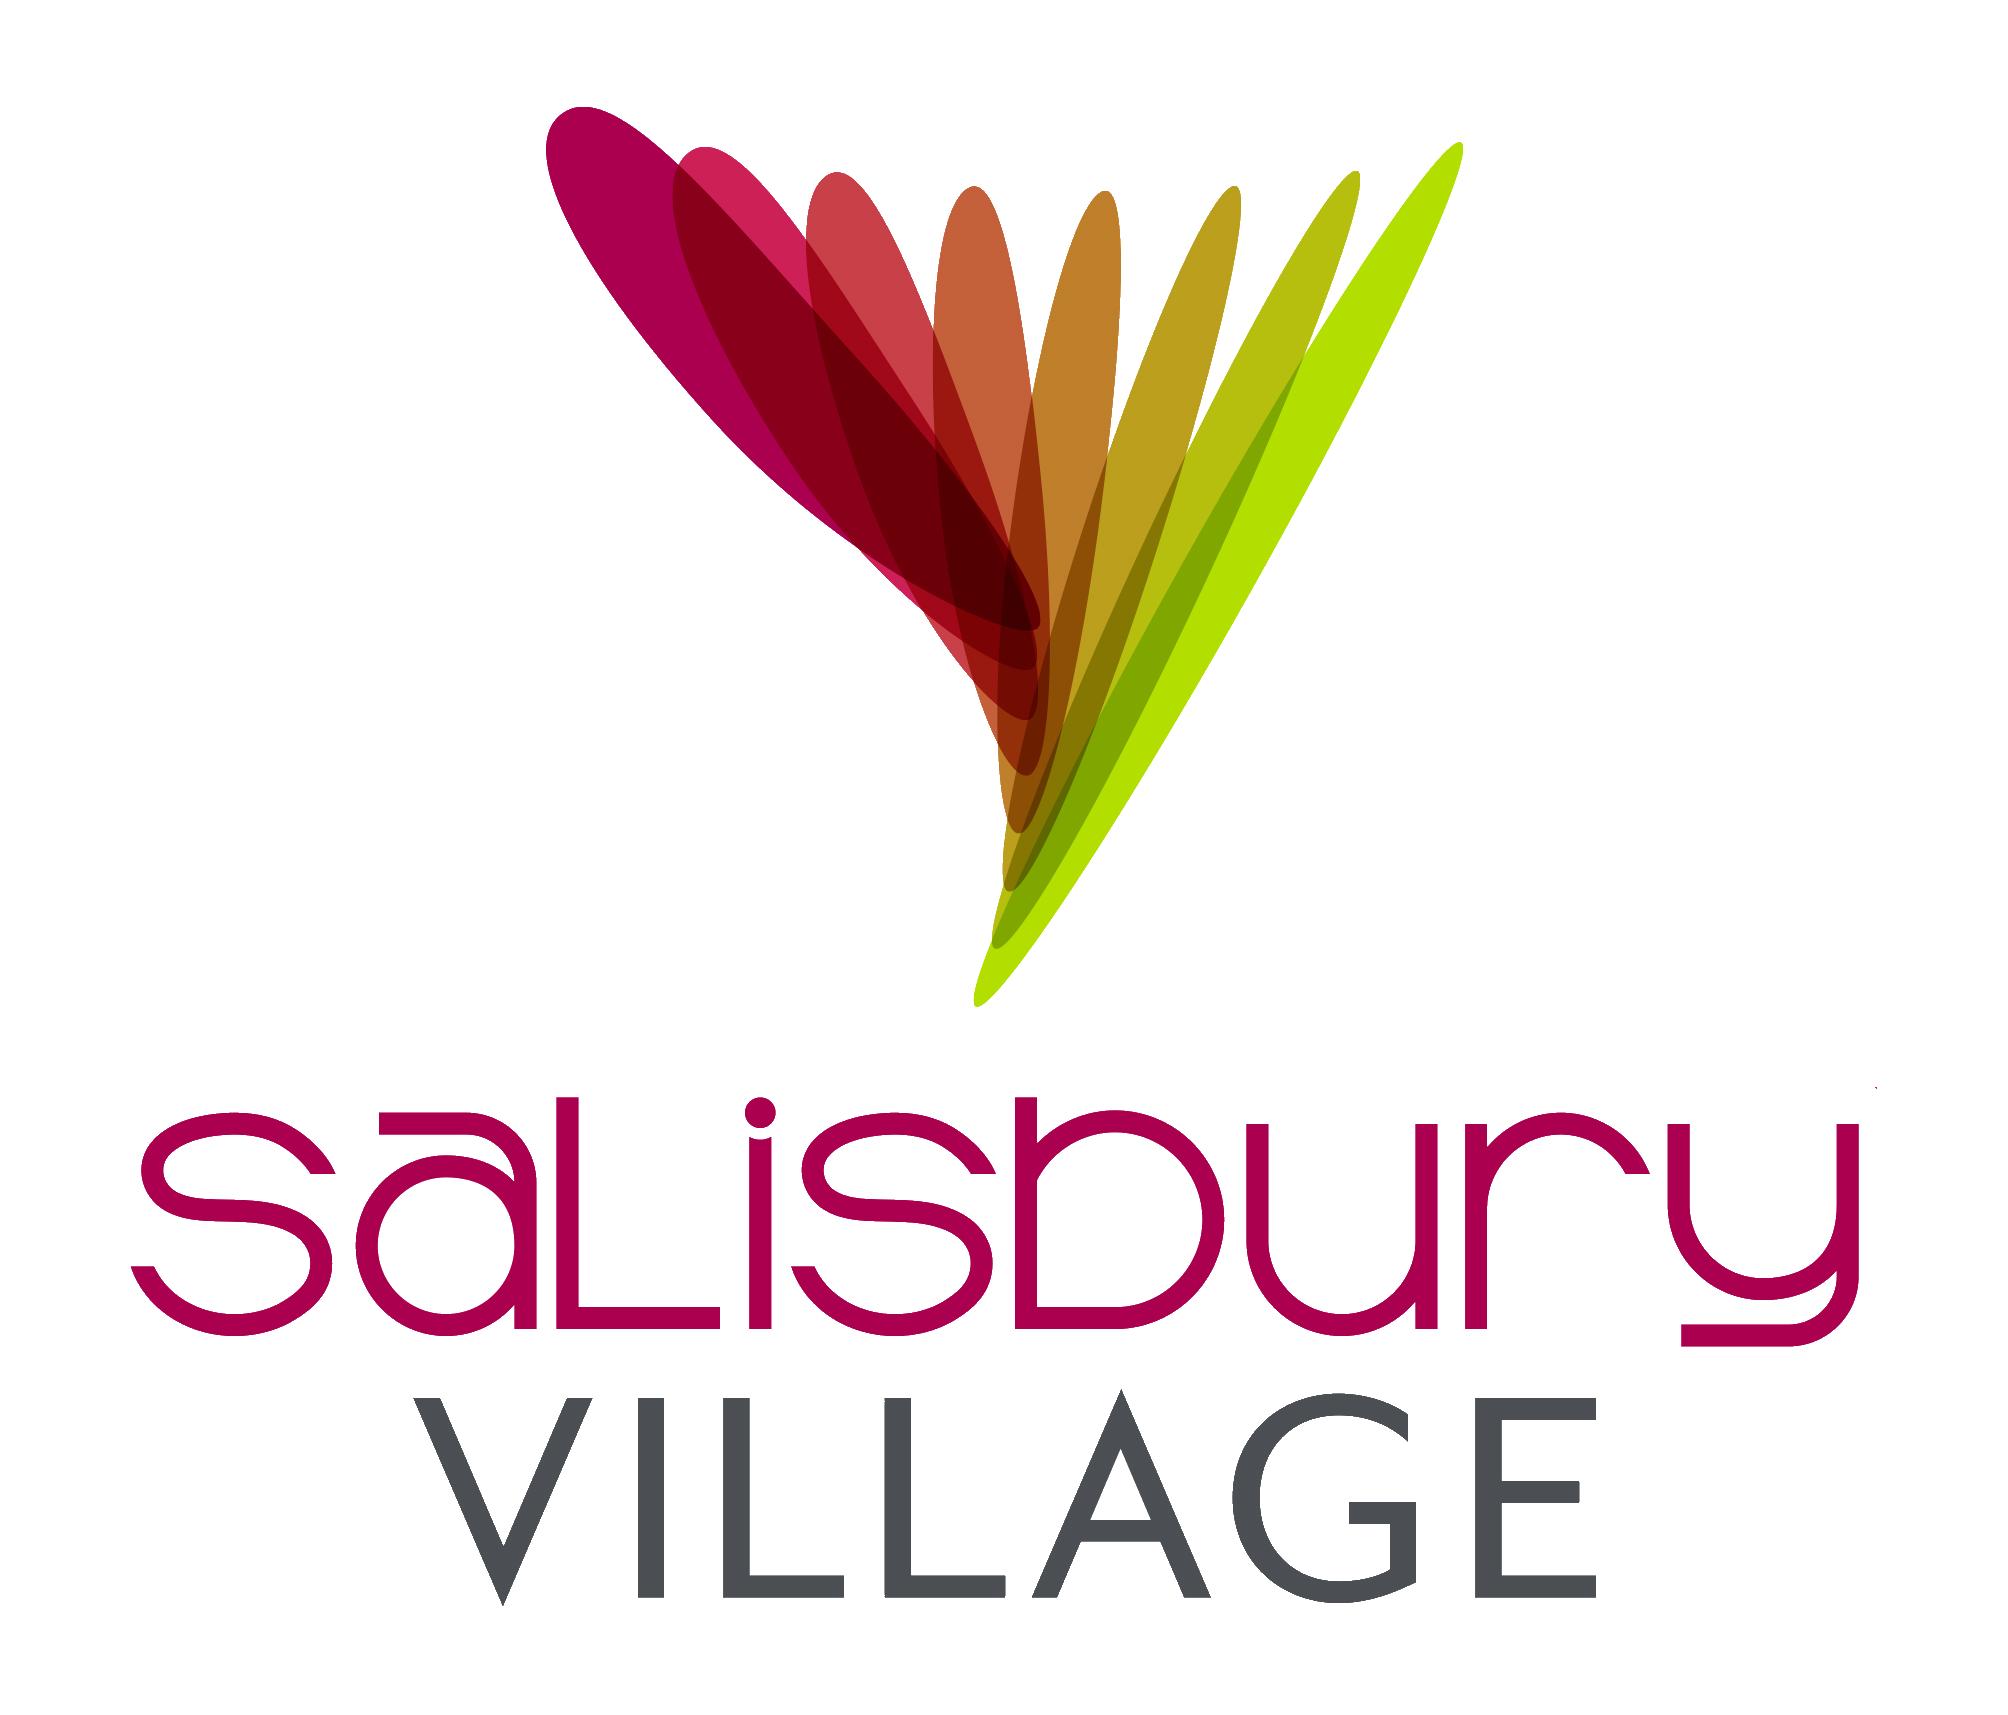 Salisbury Village logo